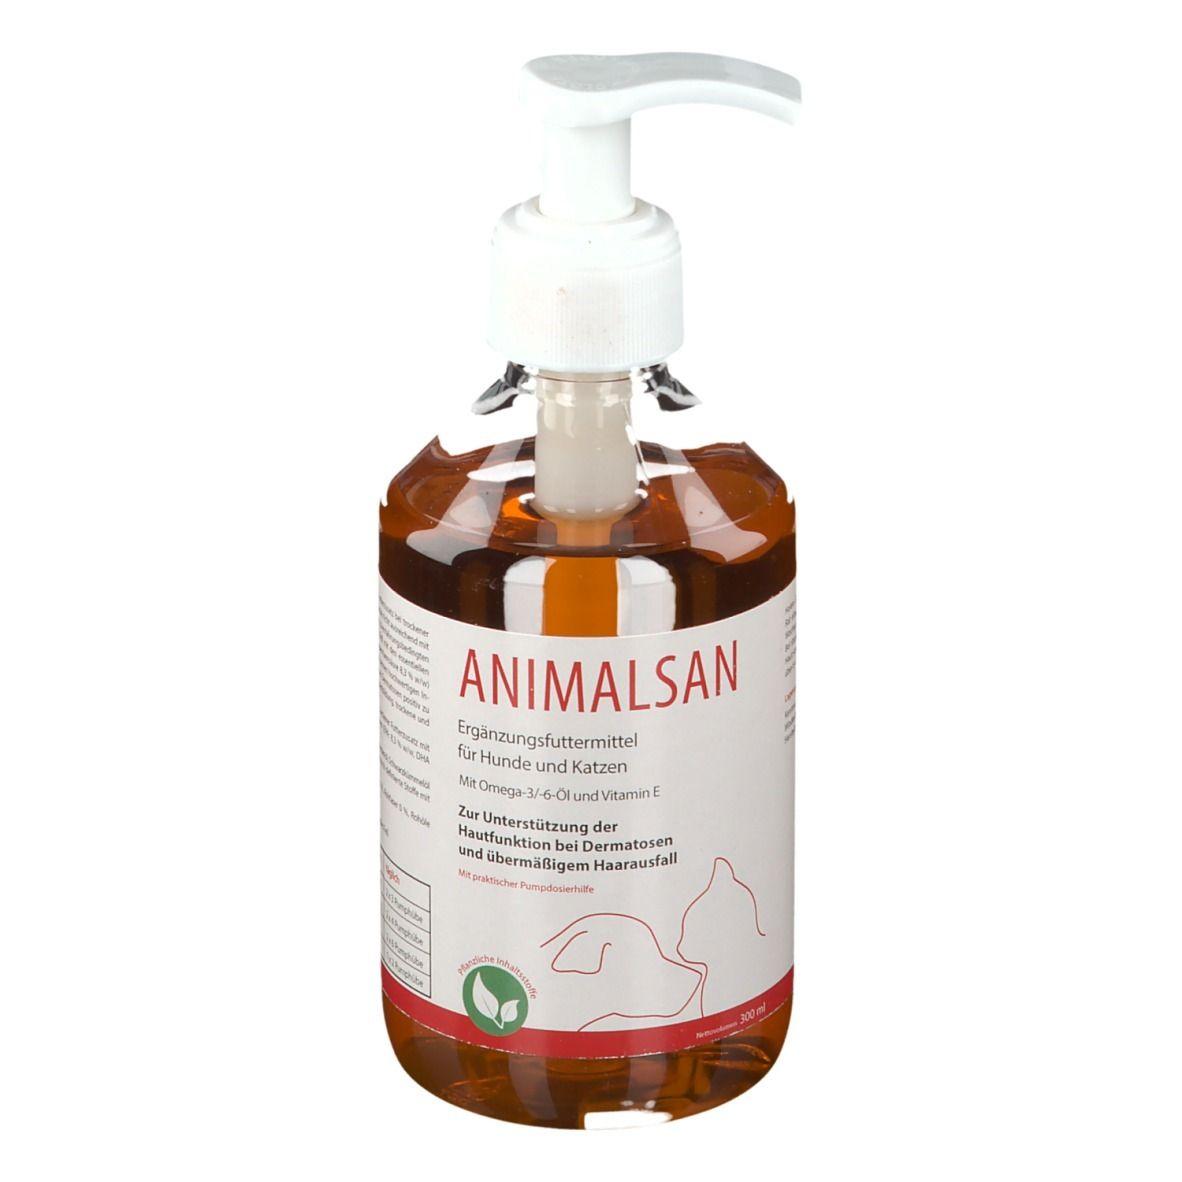 Image of Animalsan Haut & Fell